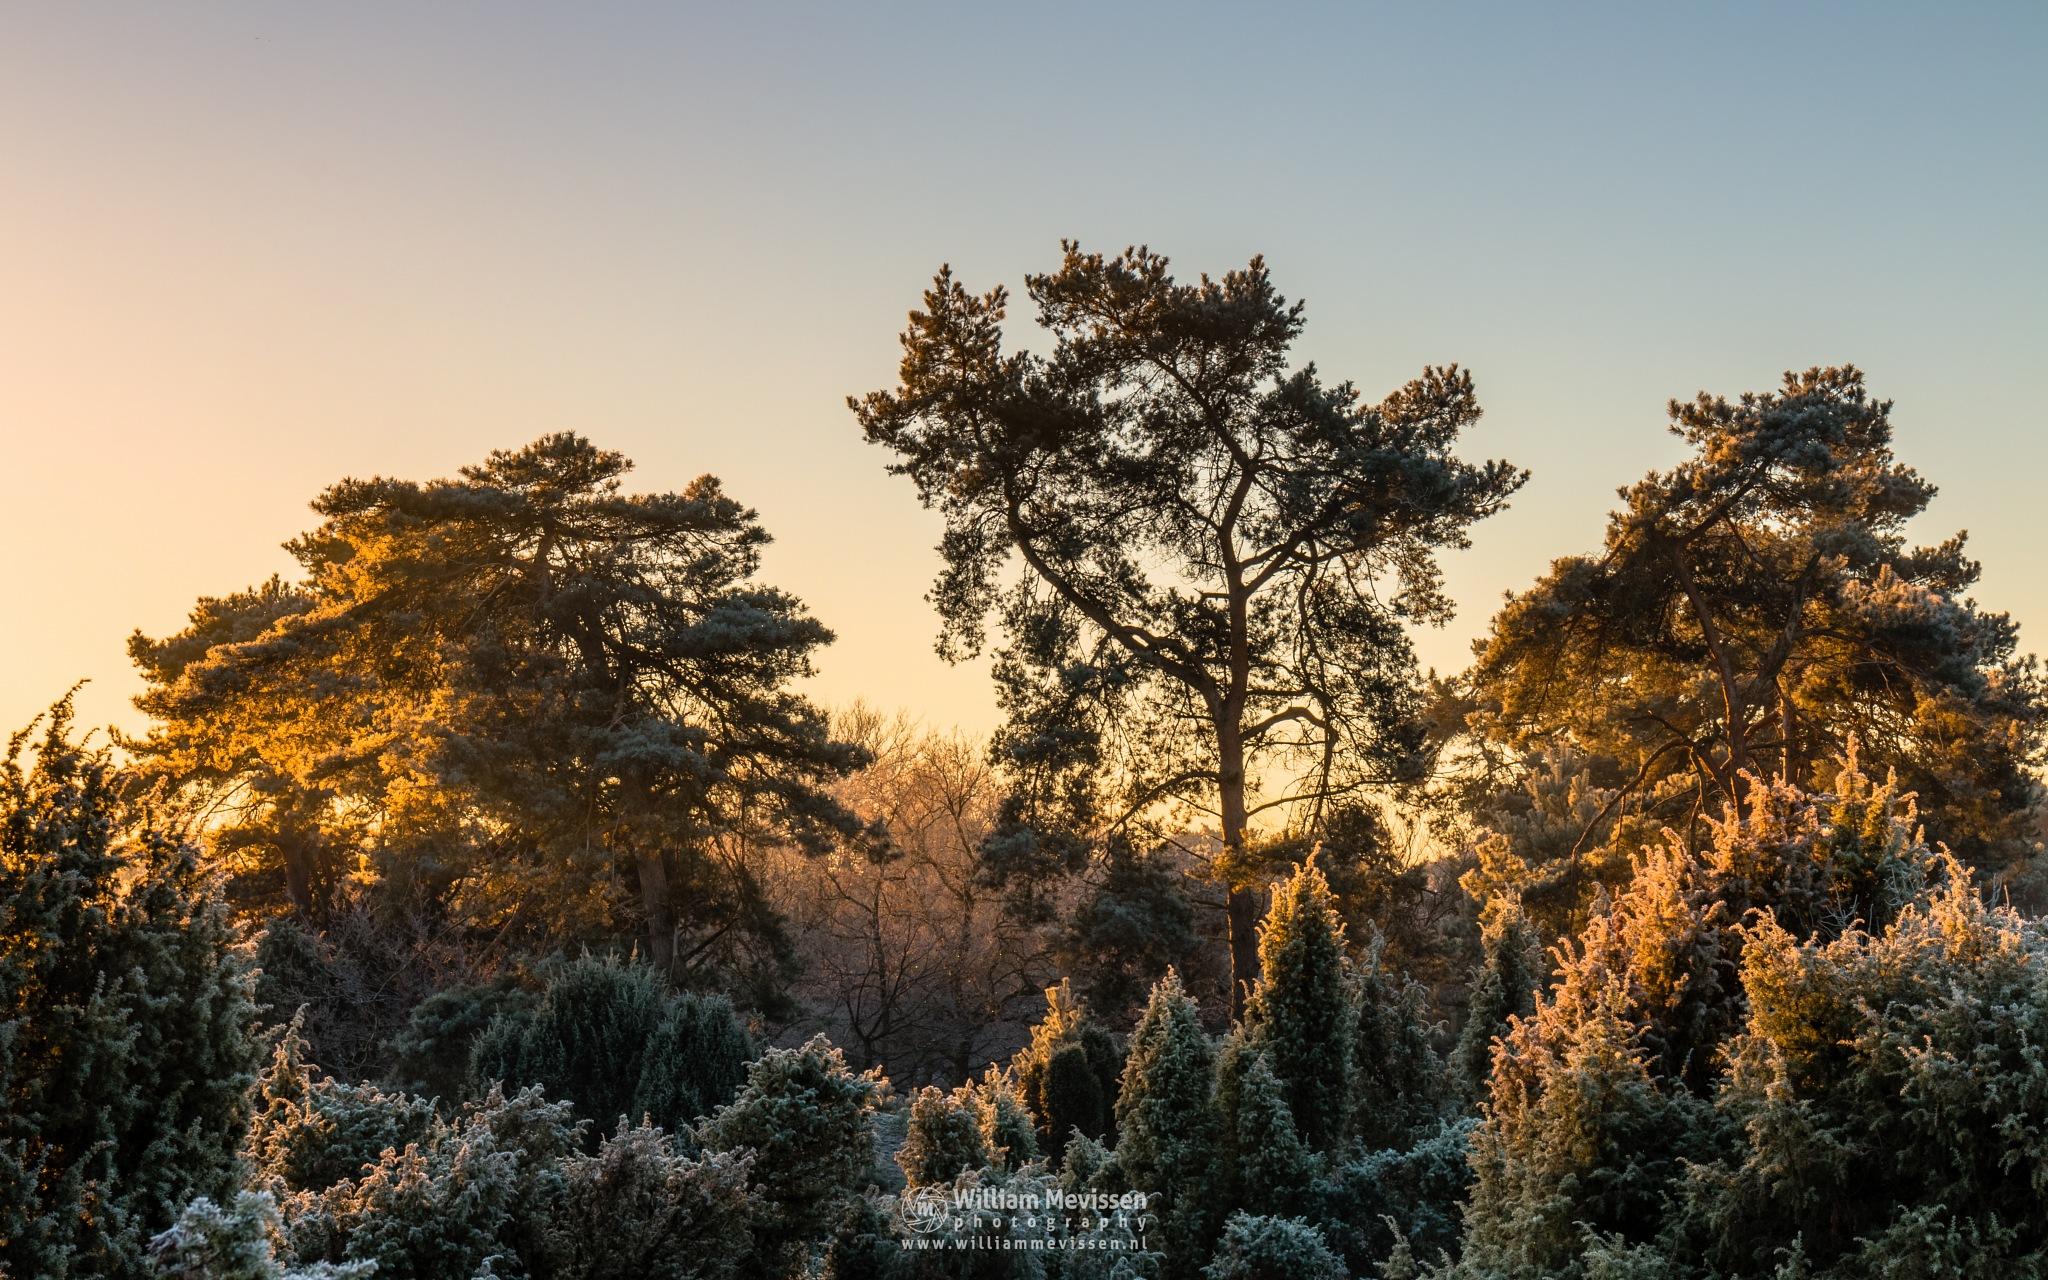 Cold Sunrise by William Mevissen